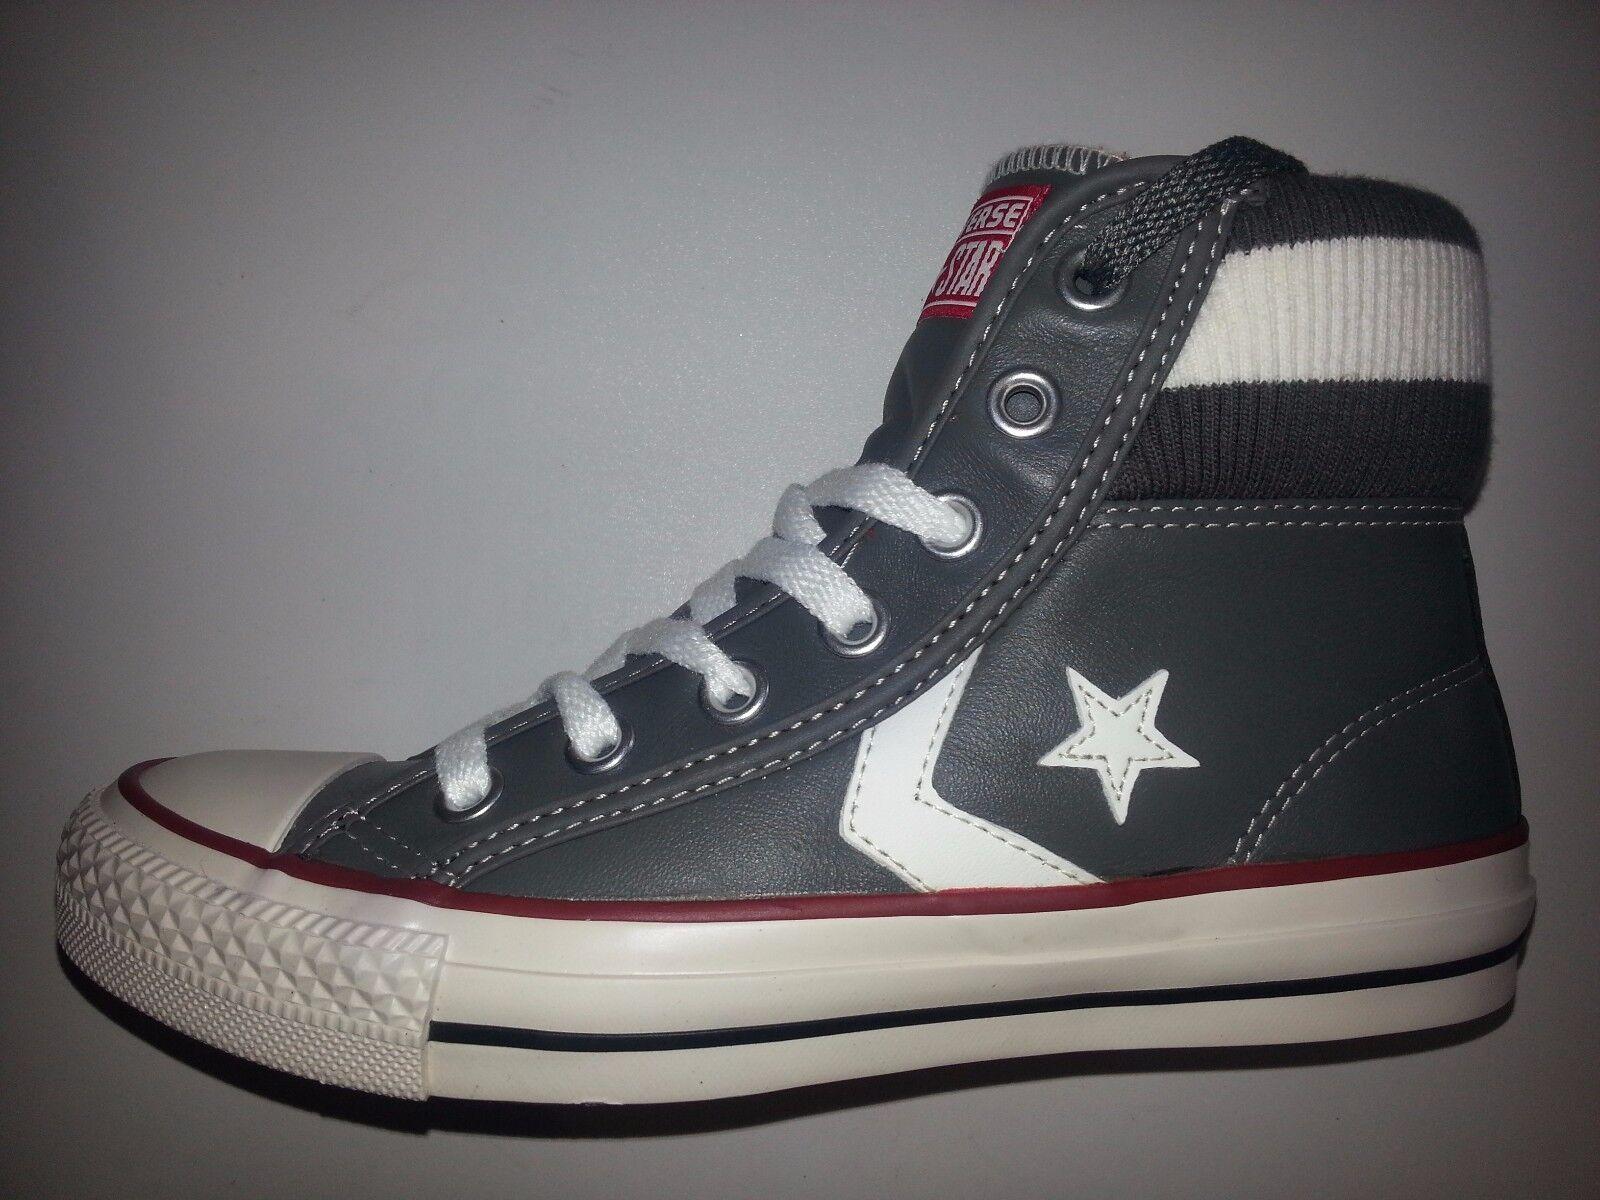 Converse Star Player Cuf Damen Mädchen Leder Sneaker grau-weiß Größe 36 NEU